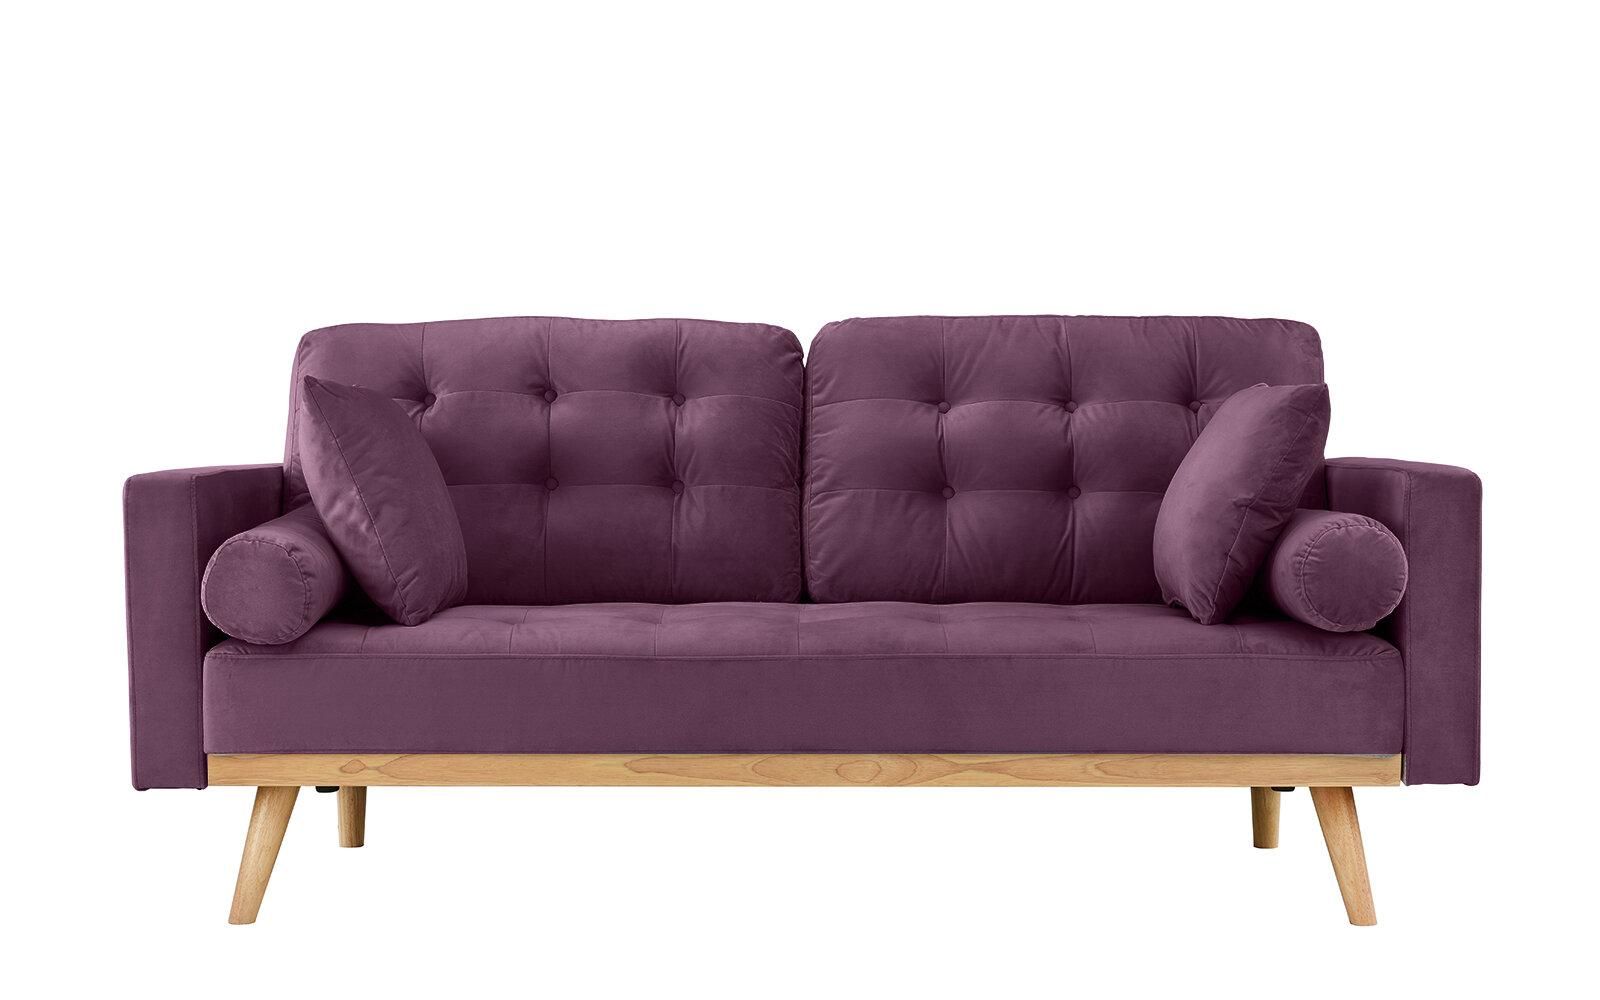 Superbe Wrought Studio Seagle Mid Century Modern Sofa U0026 Reviews | Wayfair